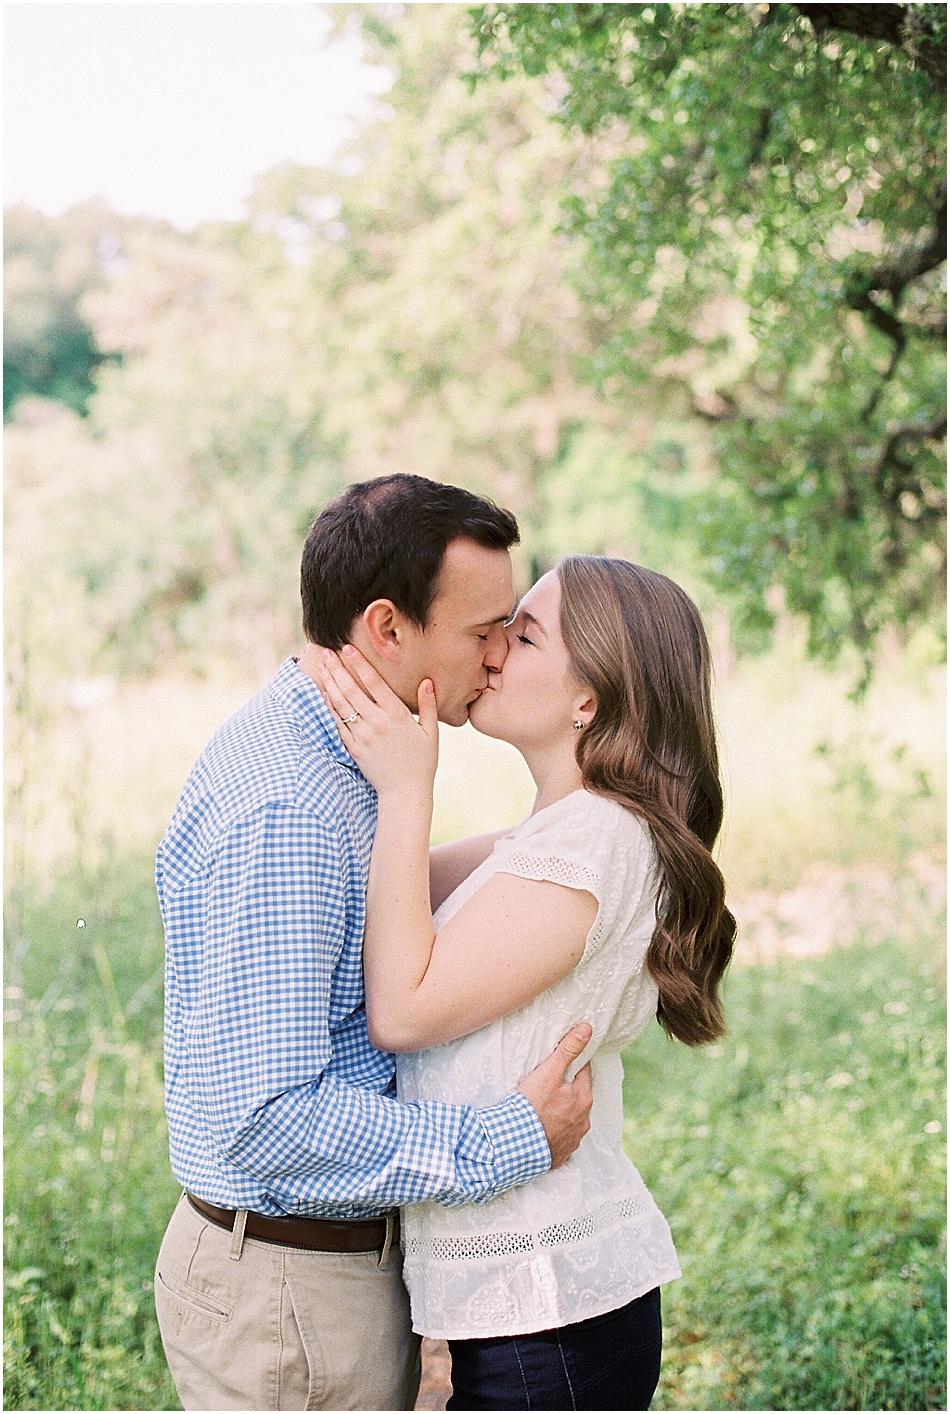 Laura + Nick | Engagement | Fine Art Film | Austin Texas | Emilie Anne Photography-25.jpg